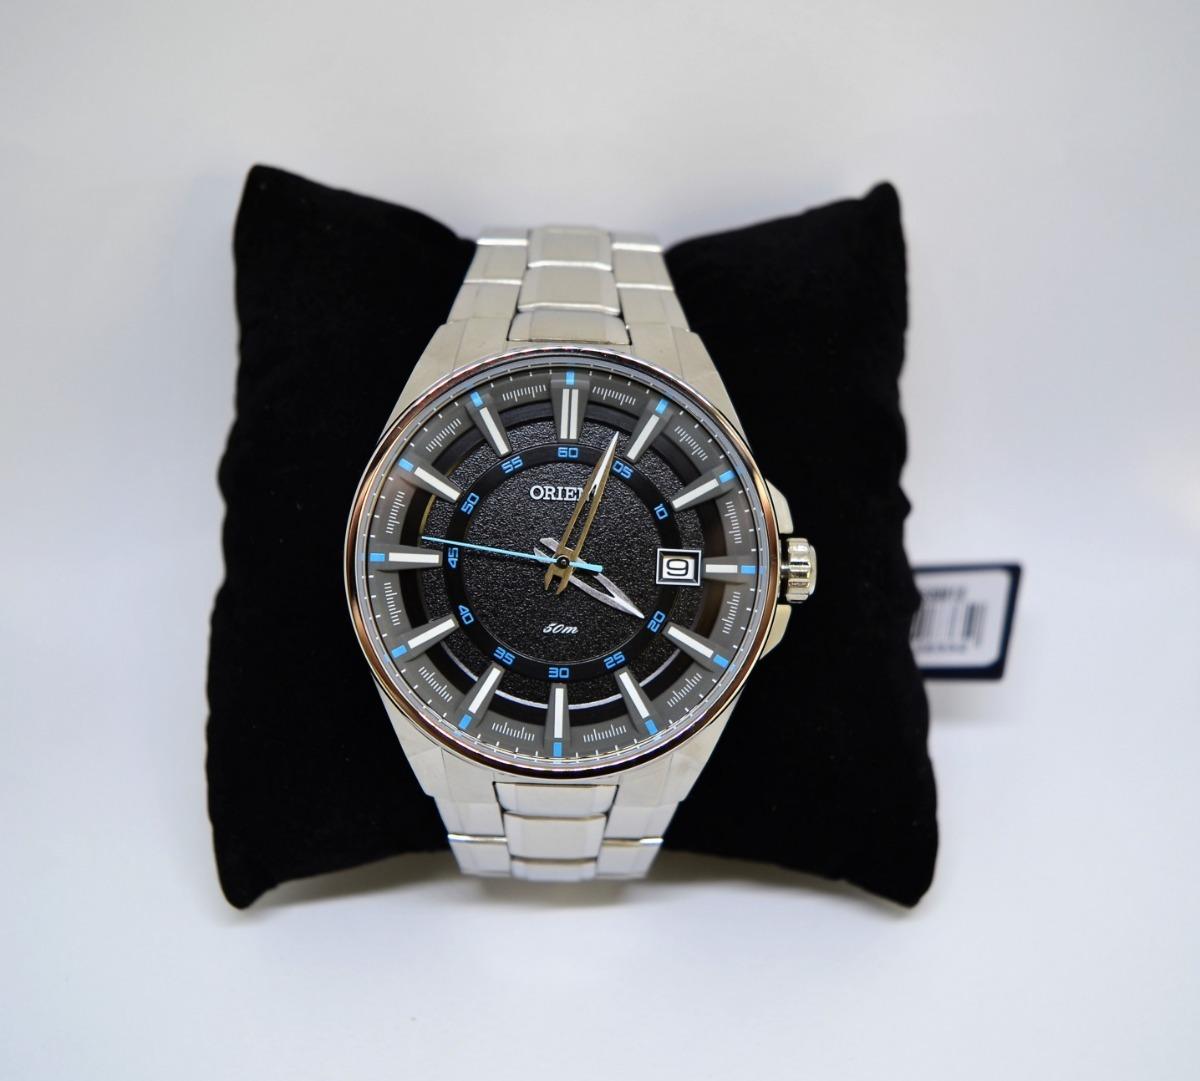 9ee1fce0fcc Relógio Orient Masculino Prata Mbss1313 Pasx Calendário - R  270